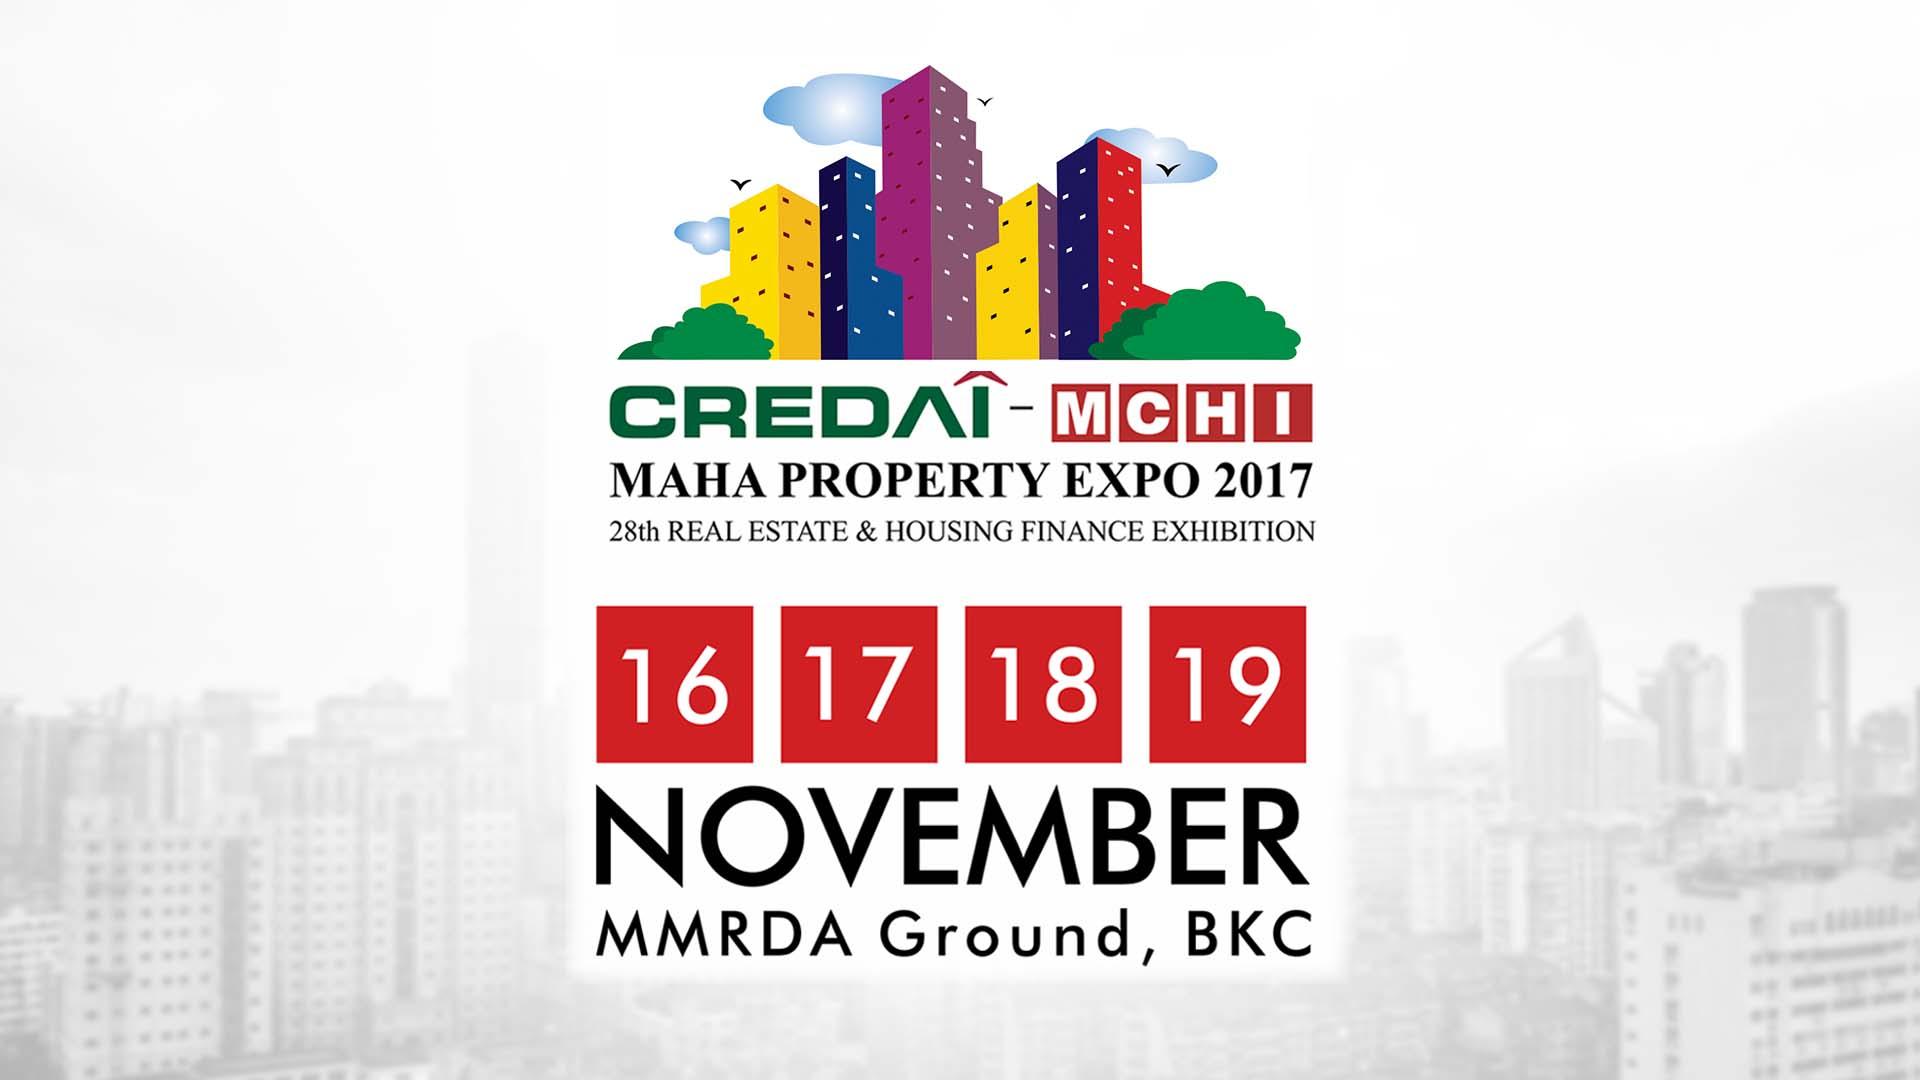 CREDAI-MCHI Maha Property Expo 2017 Brings Achhe Din